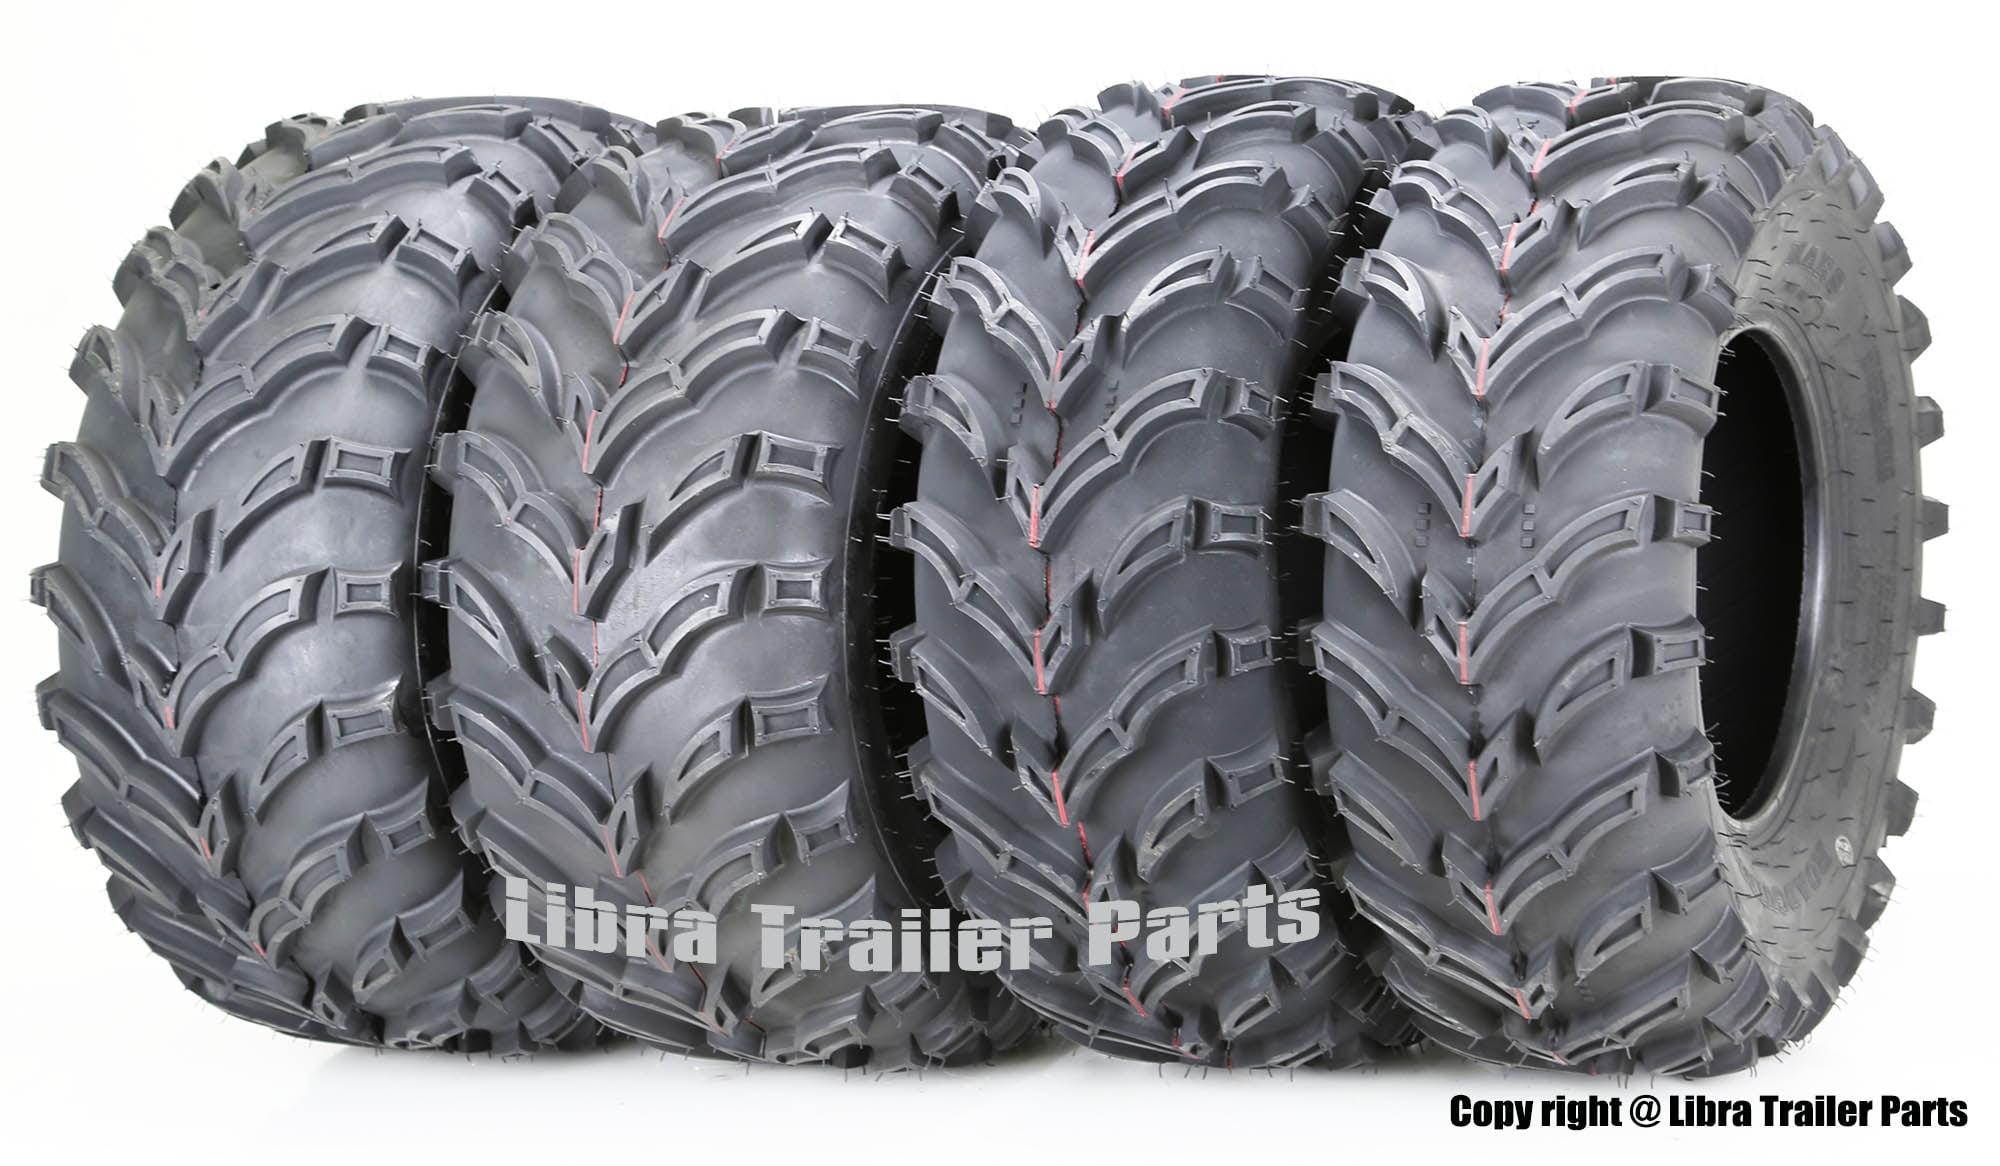 TireChain.com Arctic Cat 500 4x4 Automatic TBX 25x11-12 Rear ATV Tire Chains